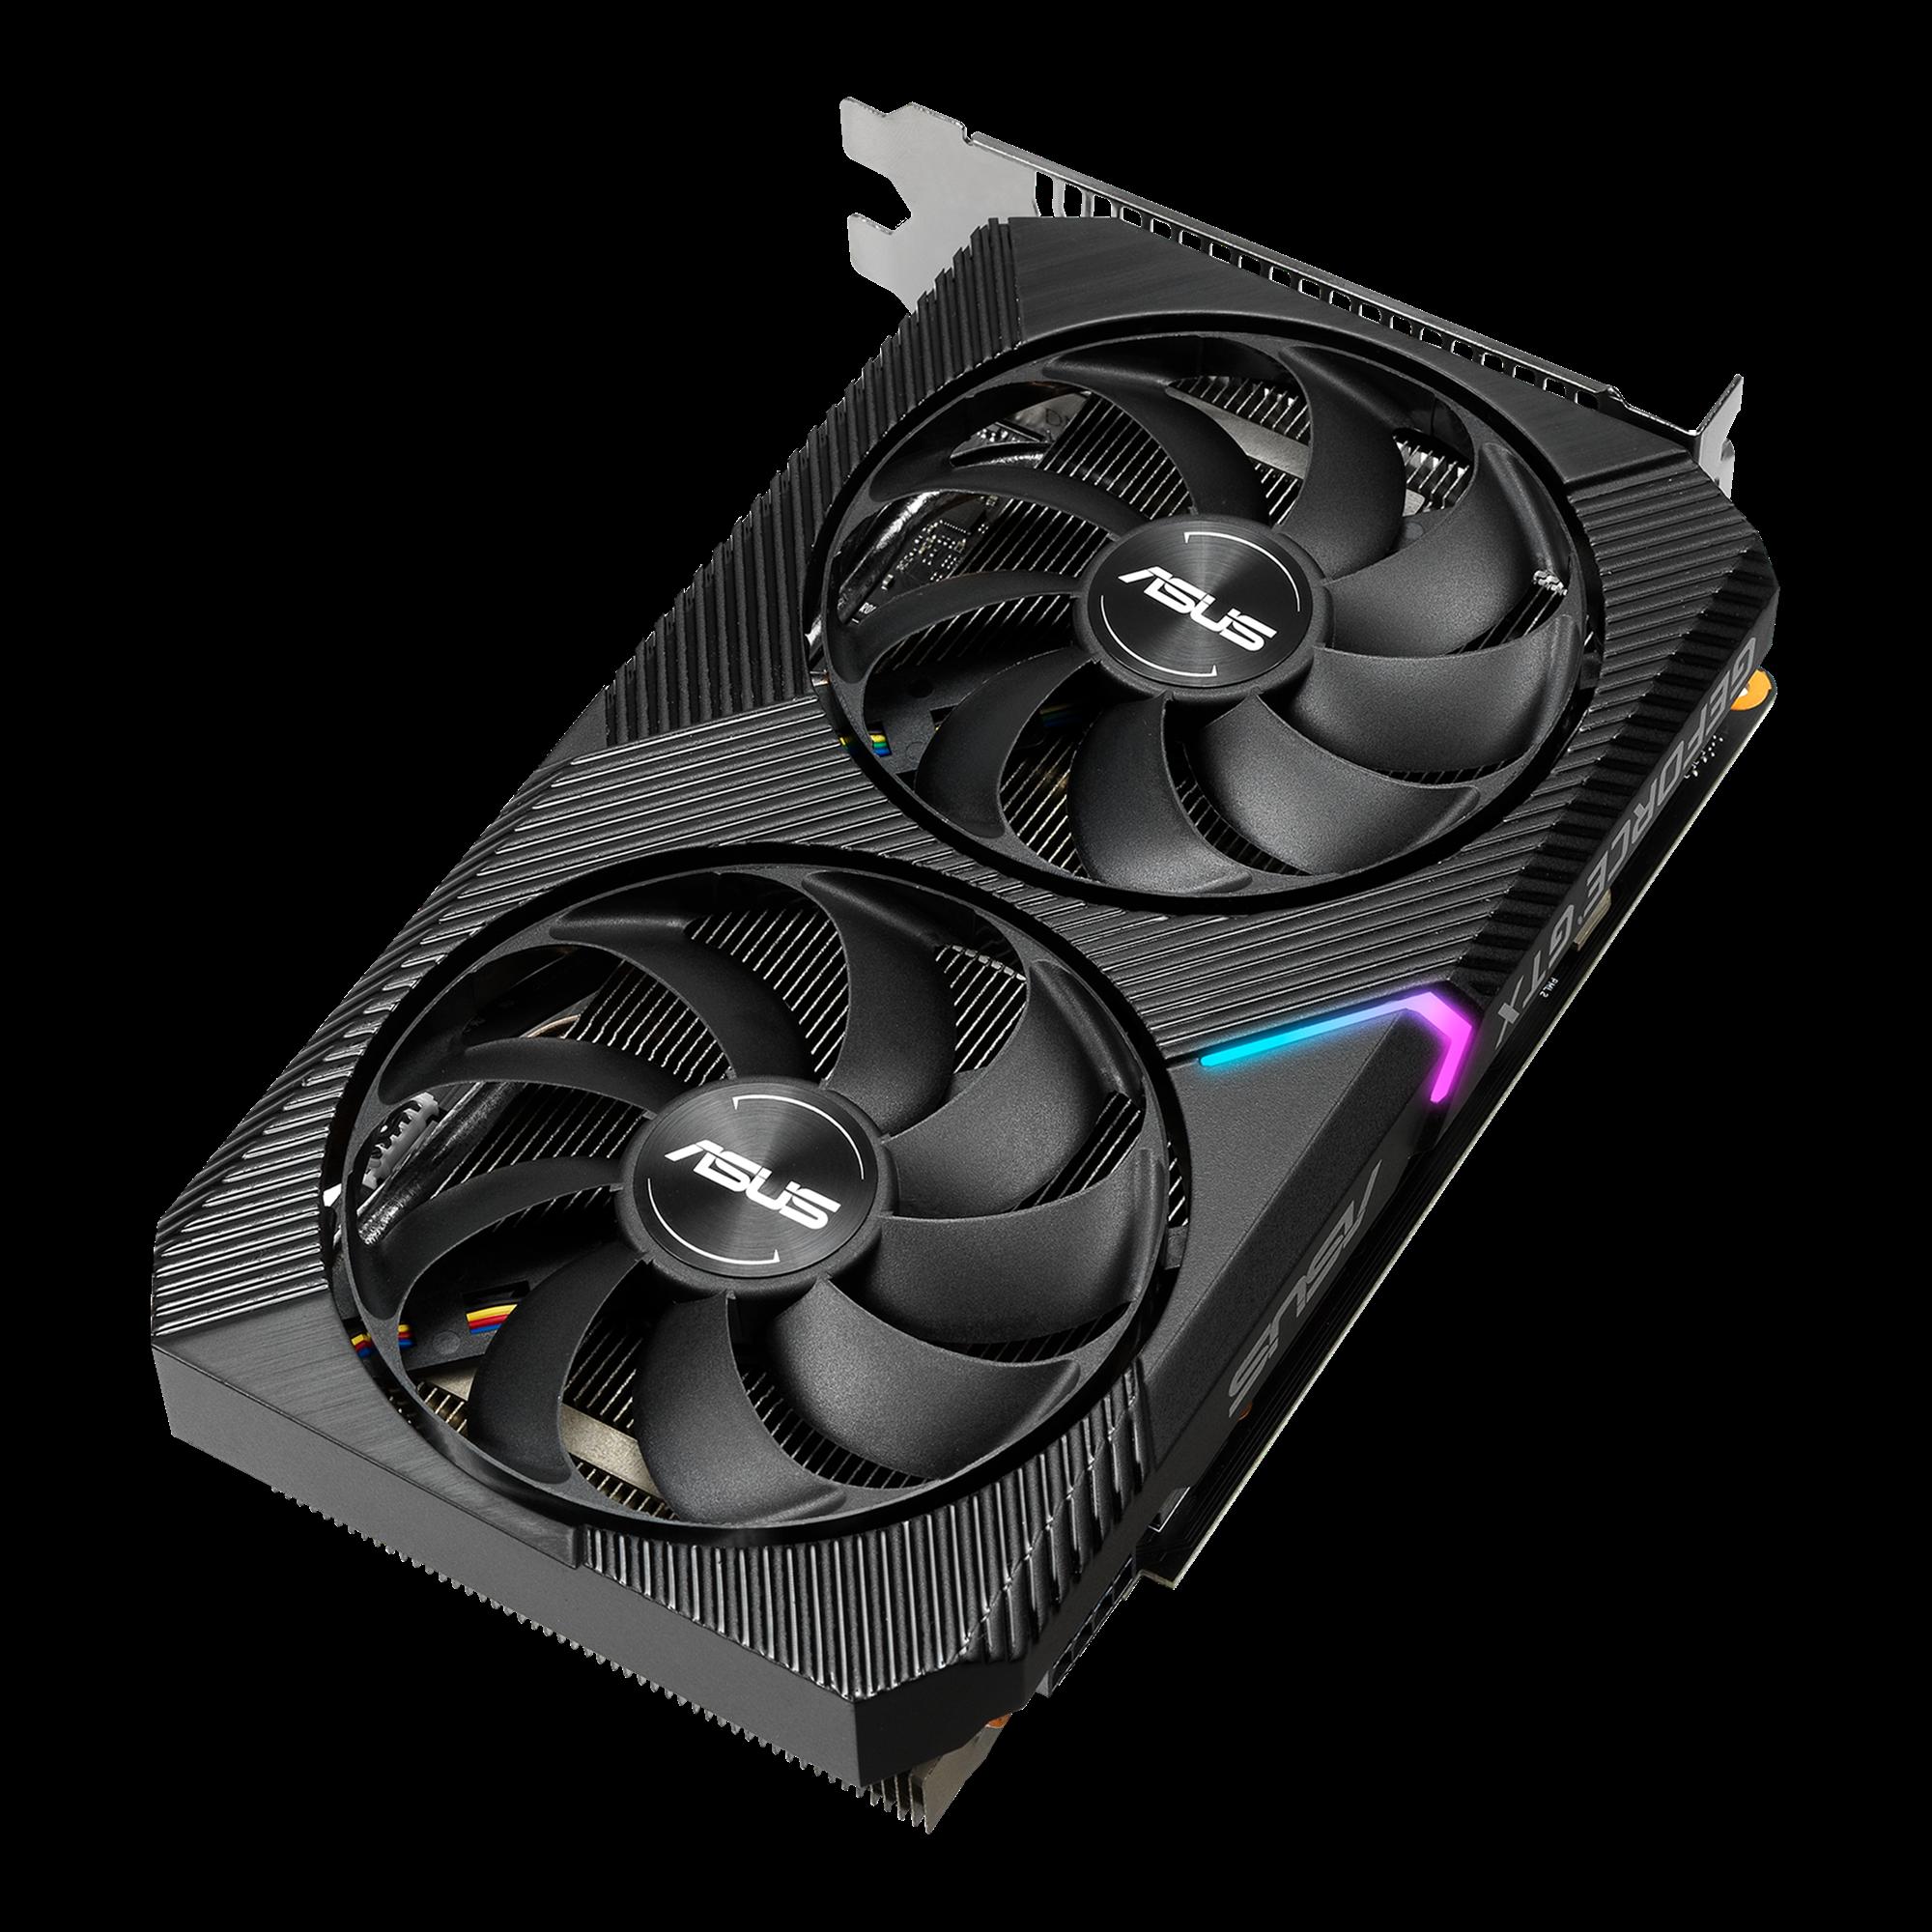 PCIe 3.0, 4GB GDDR6 Memory, HDMI, DisplayPort, DVI-D, for Intel NUC 9 Extreme Kit, Intel NUC 9 Pro Kit, and Small Chassis ASUS Dual NVIDIA GeForce GTX 1650 Mini OC Edition Gaming CSM Graphics Card